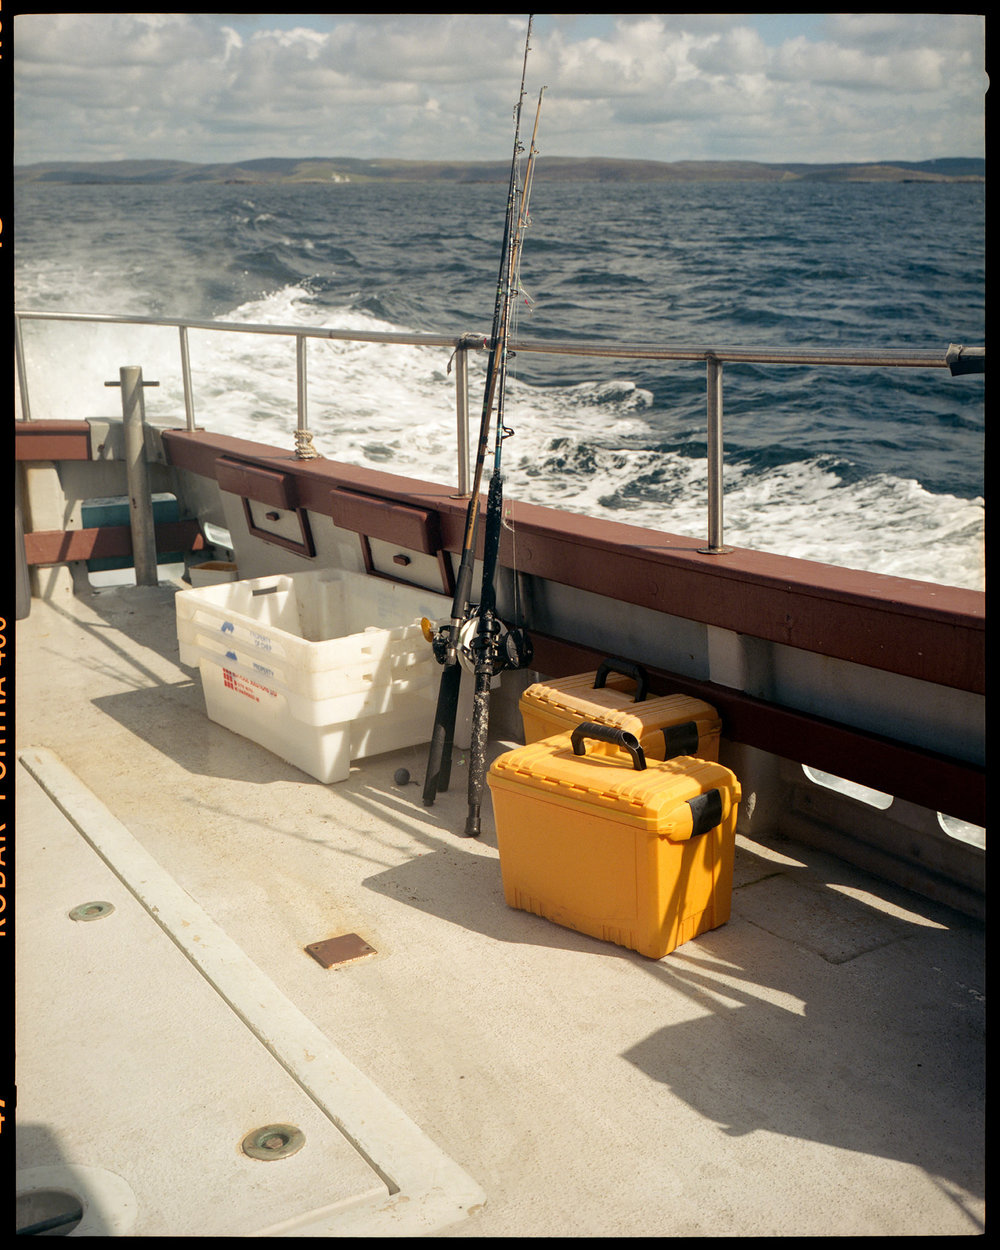 BoatTrip007 e+c LR.jpg